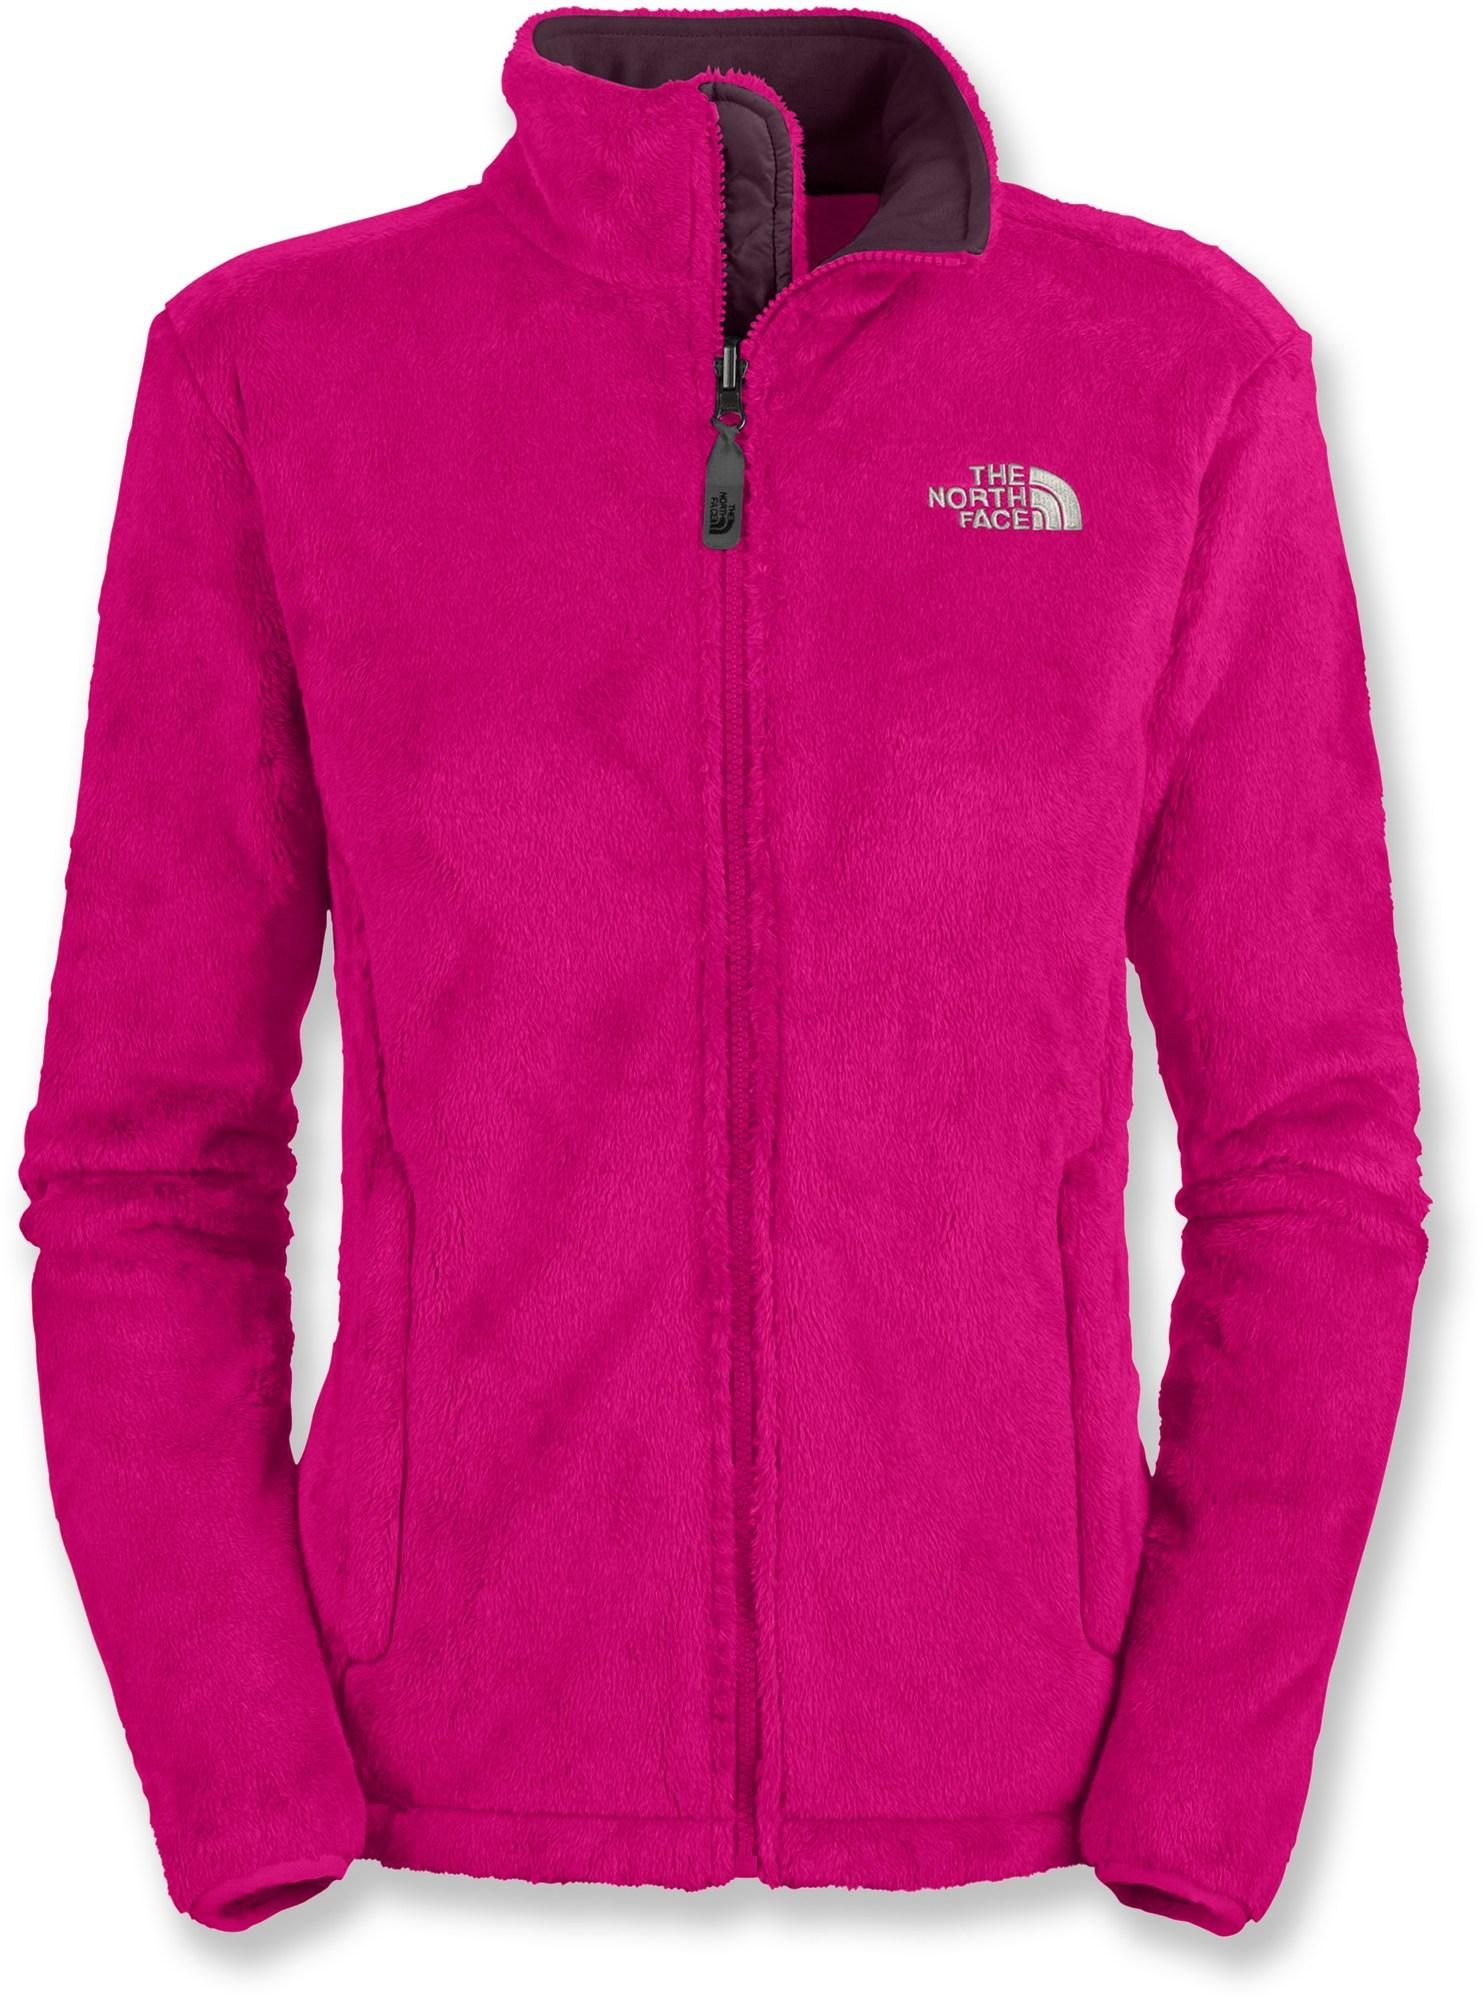 The North Face Osito Fleece Jacket Women S Rei Co Op Fleece Jacket Womens Fleece Jacket Clothes [ 2000 x 1483 Pixel ]